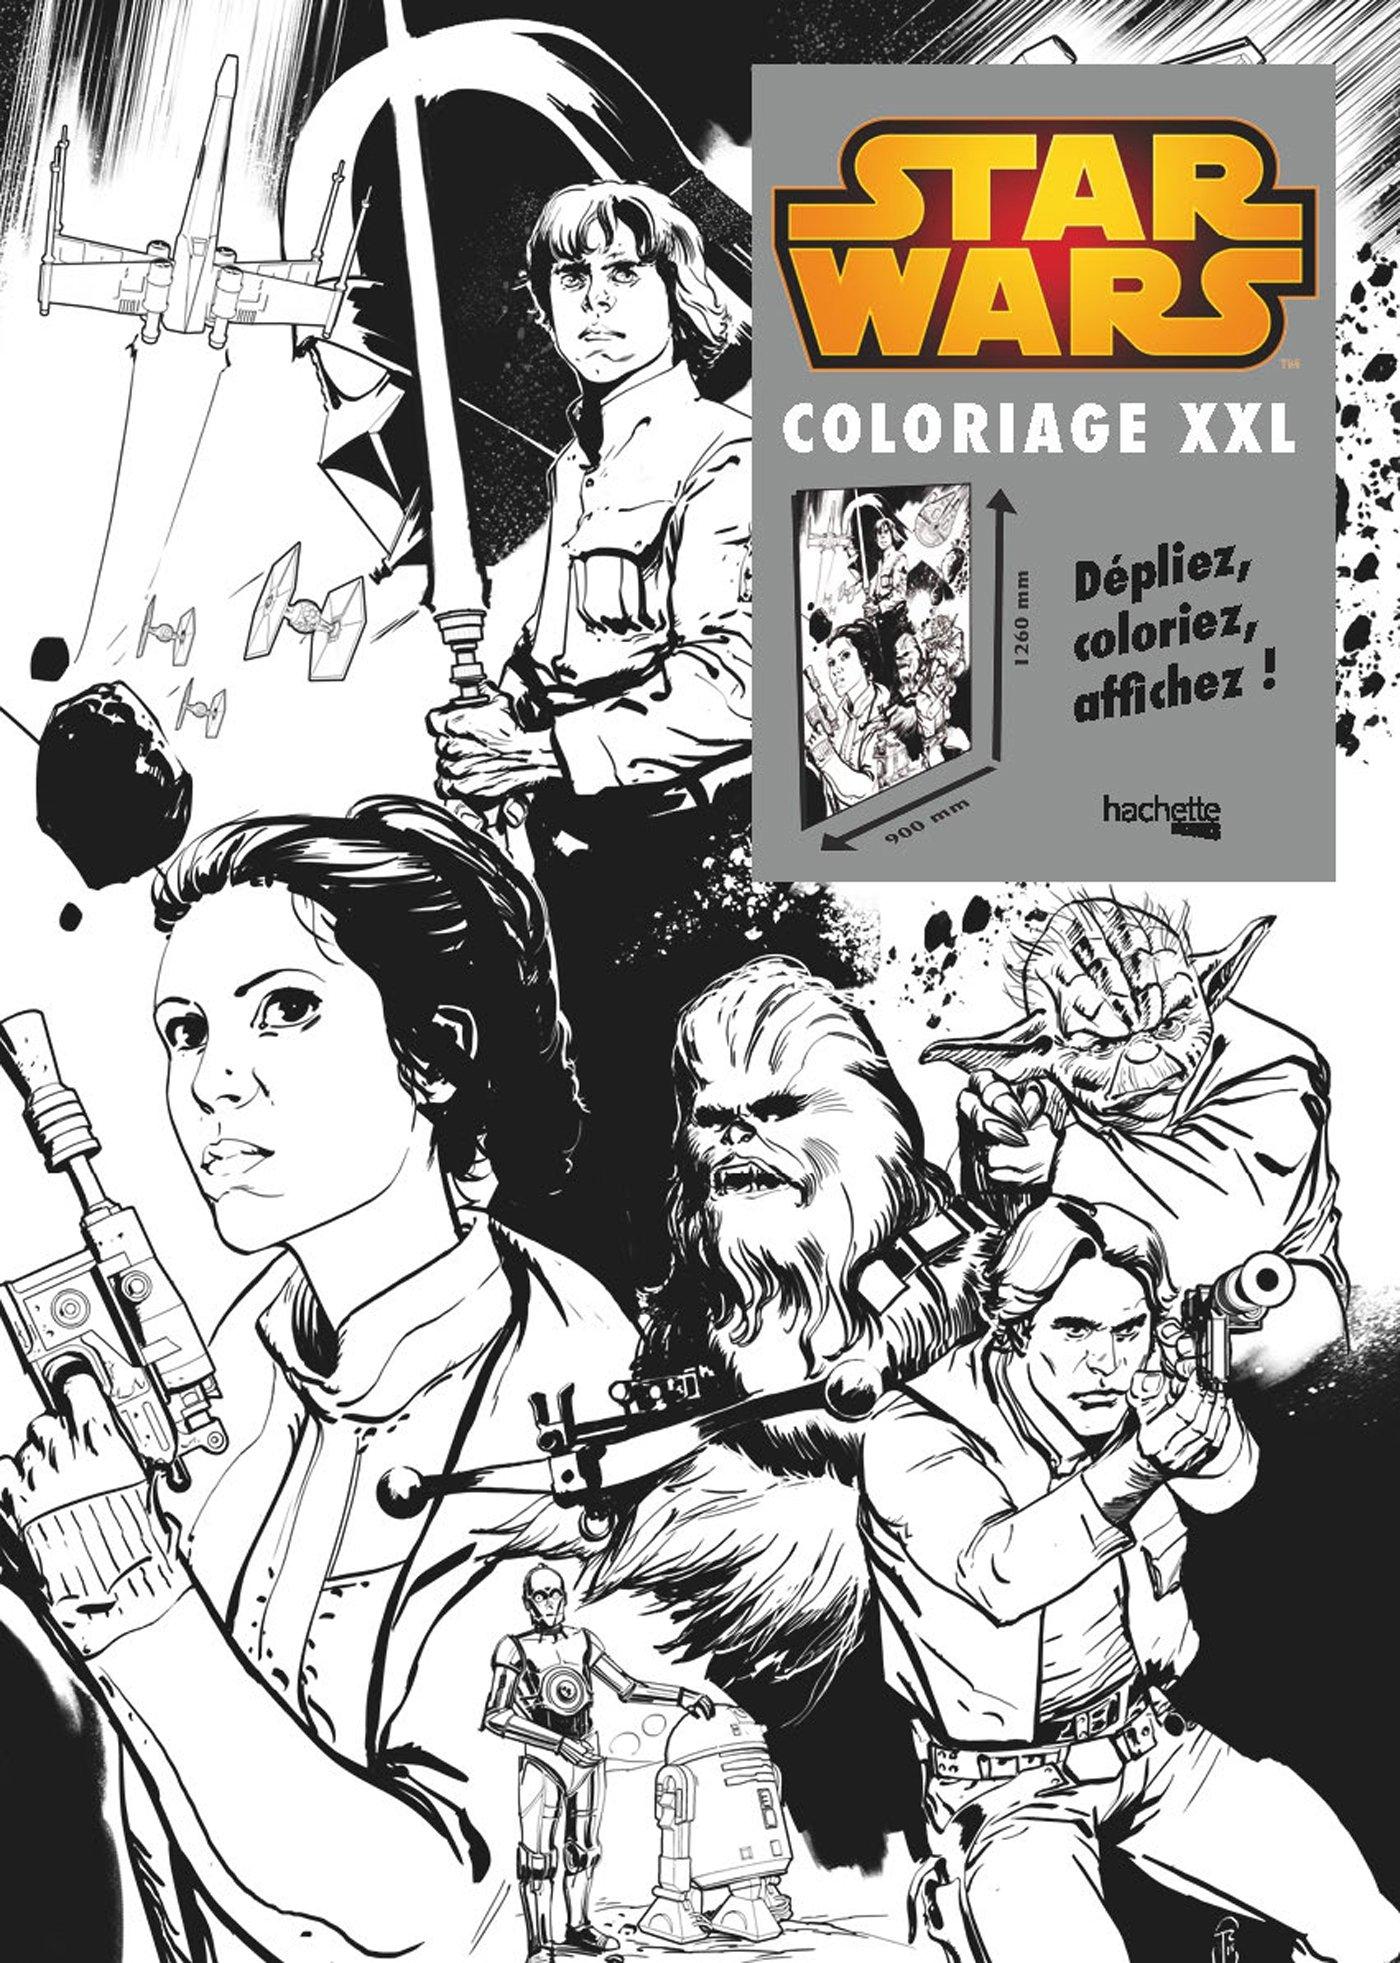 Stars Wars Rebellion Coloriage Xxl Heroes Toulhoat Ronan 9782012206274 Amazon Com Books